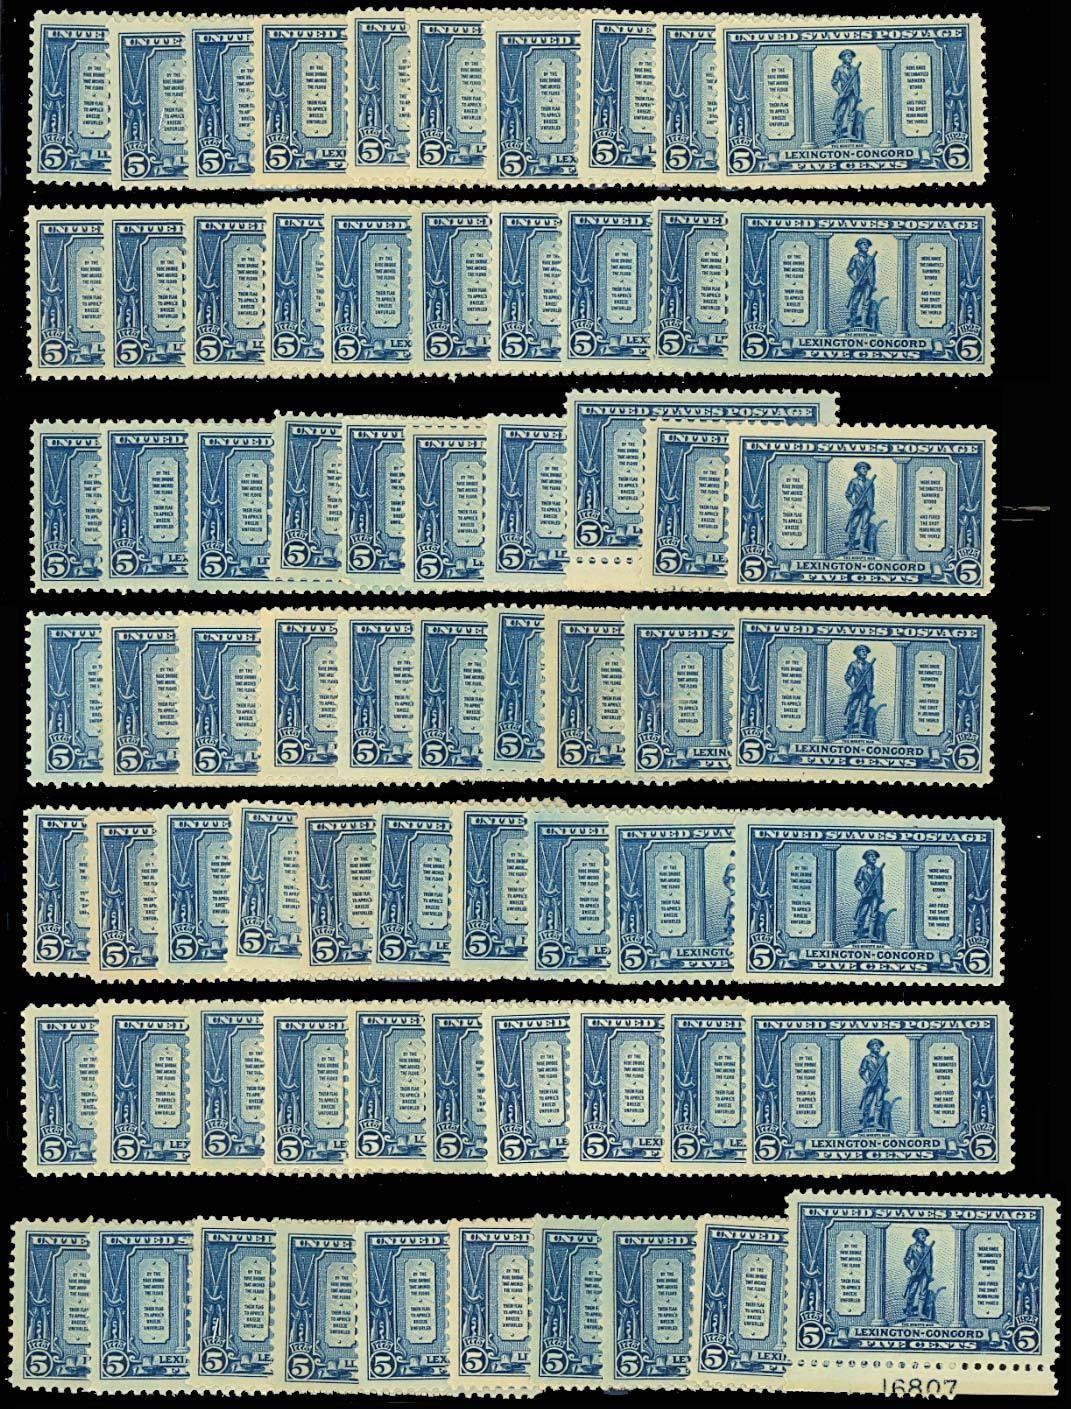 619, Mint LH 5c Minute Man - 70 COPIES! - Generally VF & Fresh! Cat $1,050.00